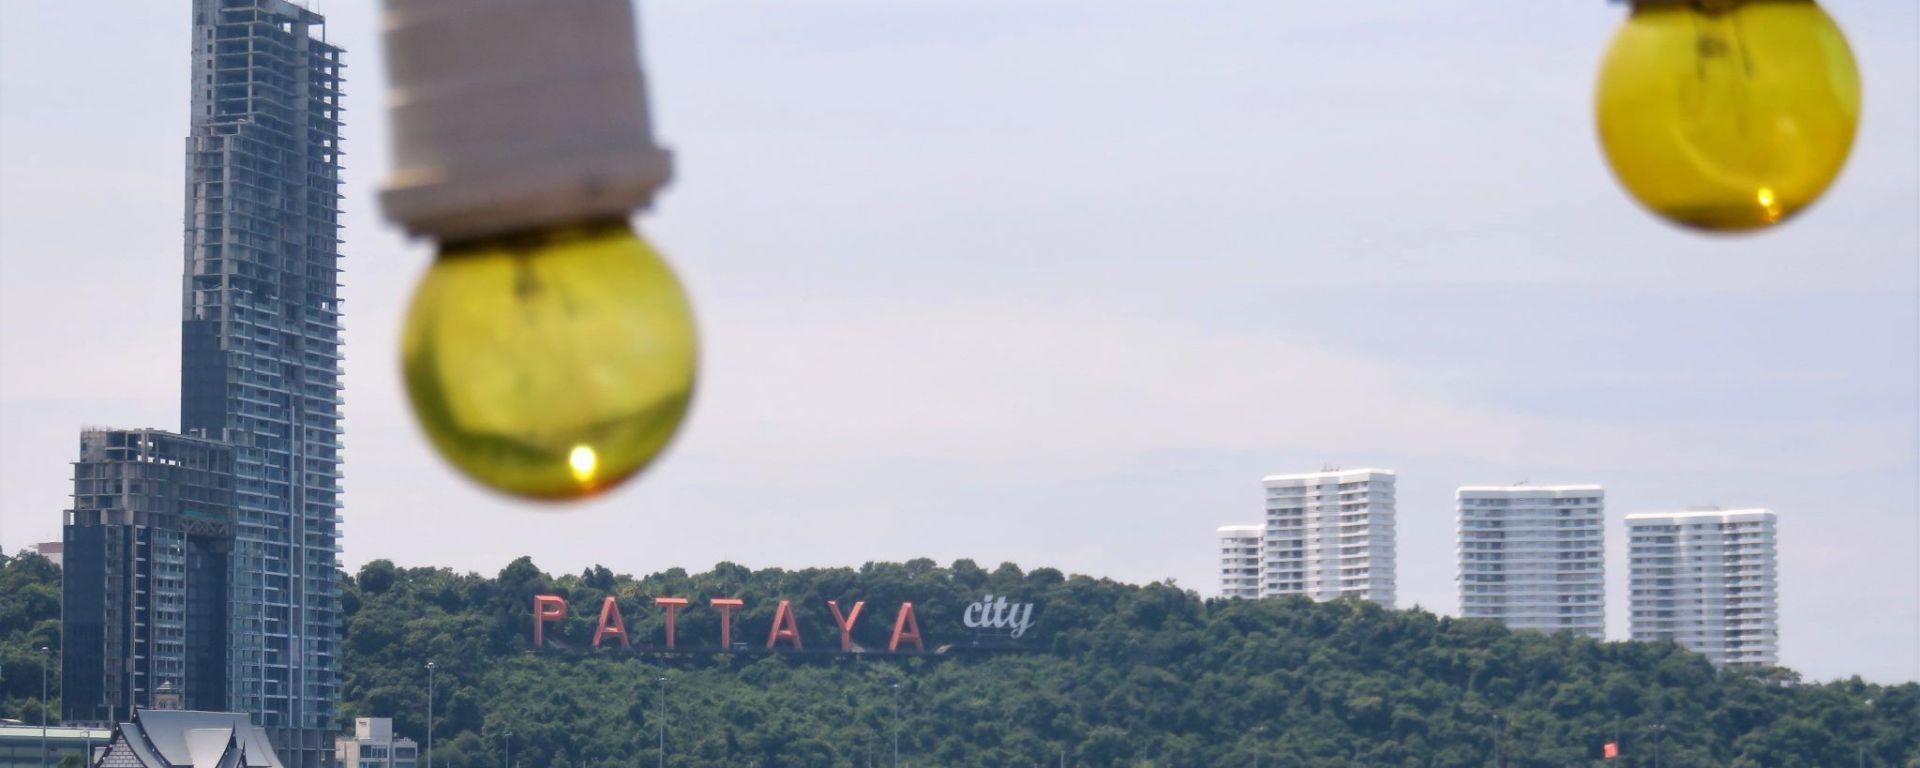 Cartel Pattaya